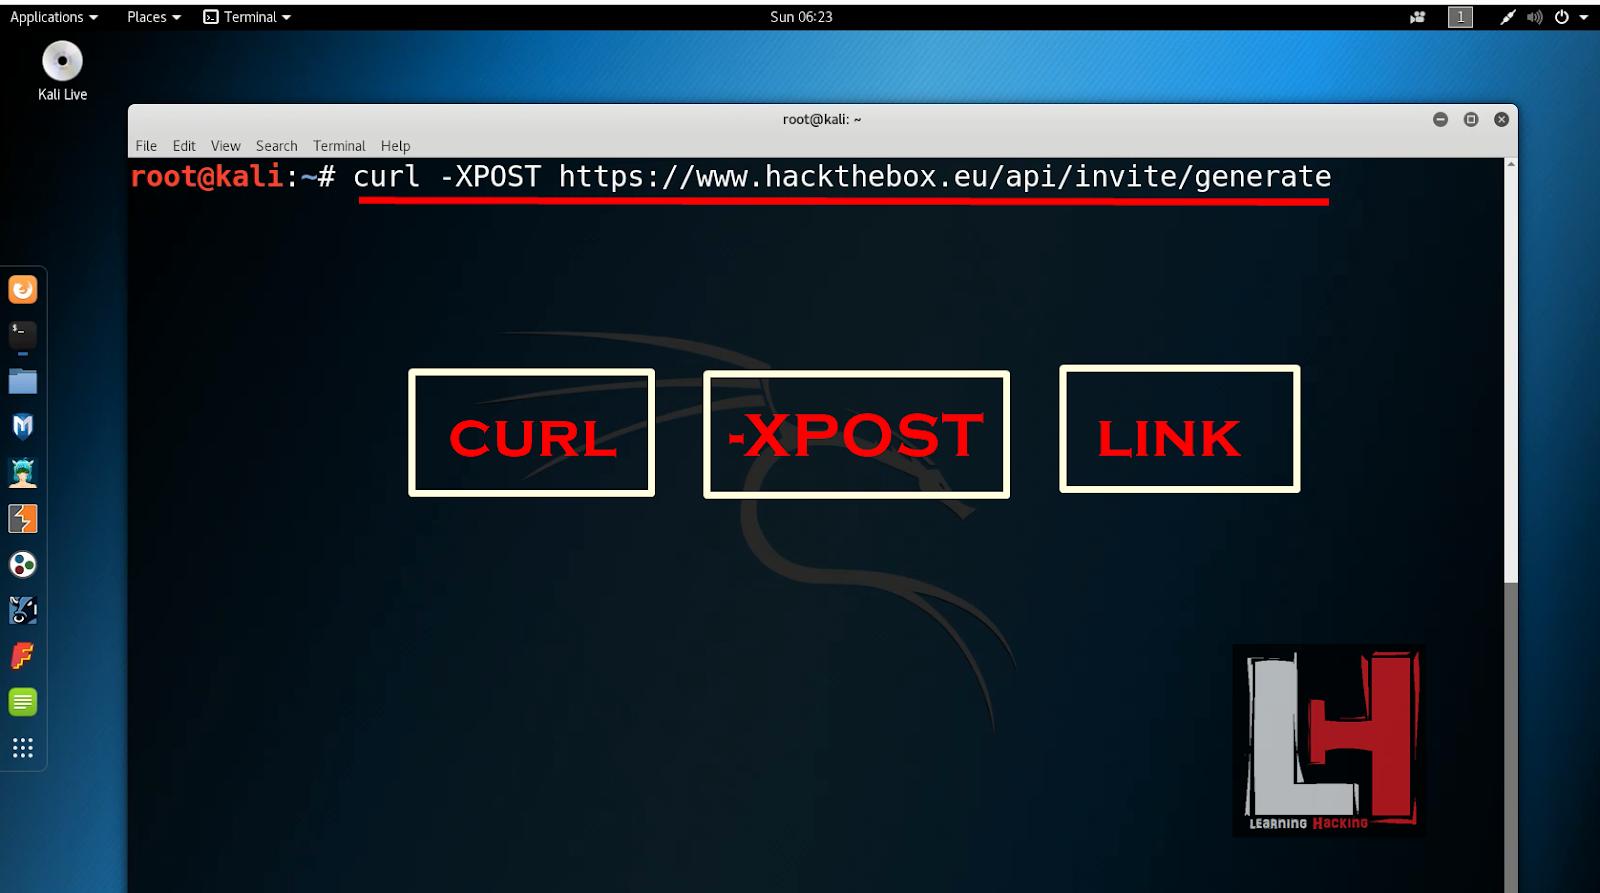 Kali 4 Hacking: Hack The Box | Hack The Box Invite Code